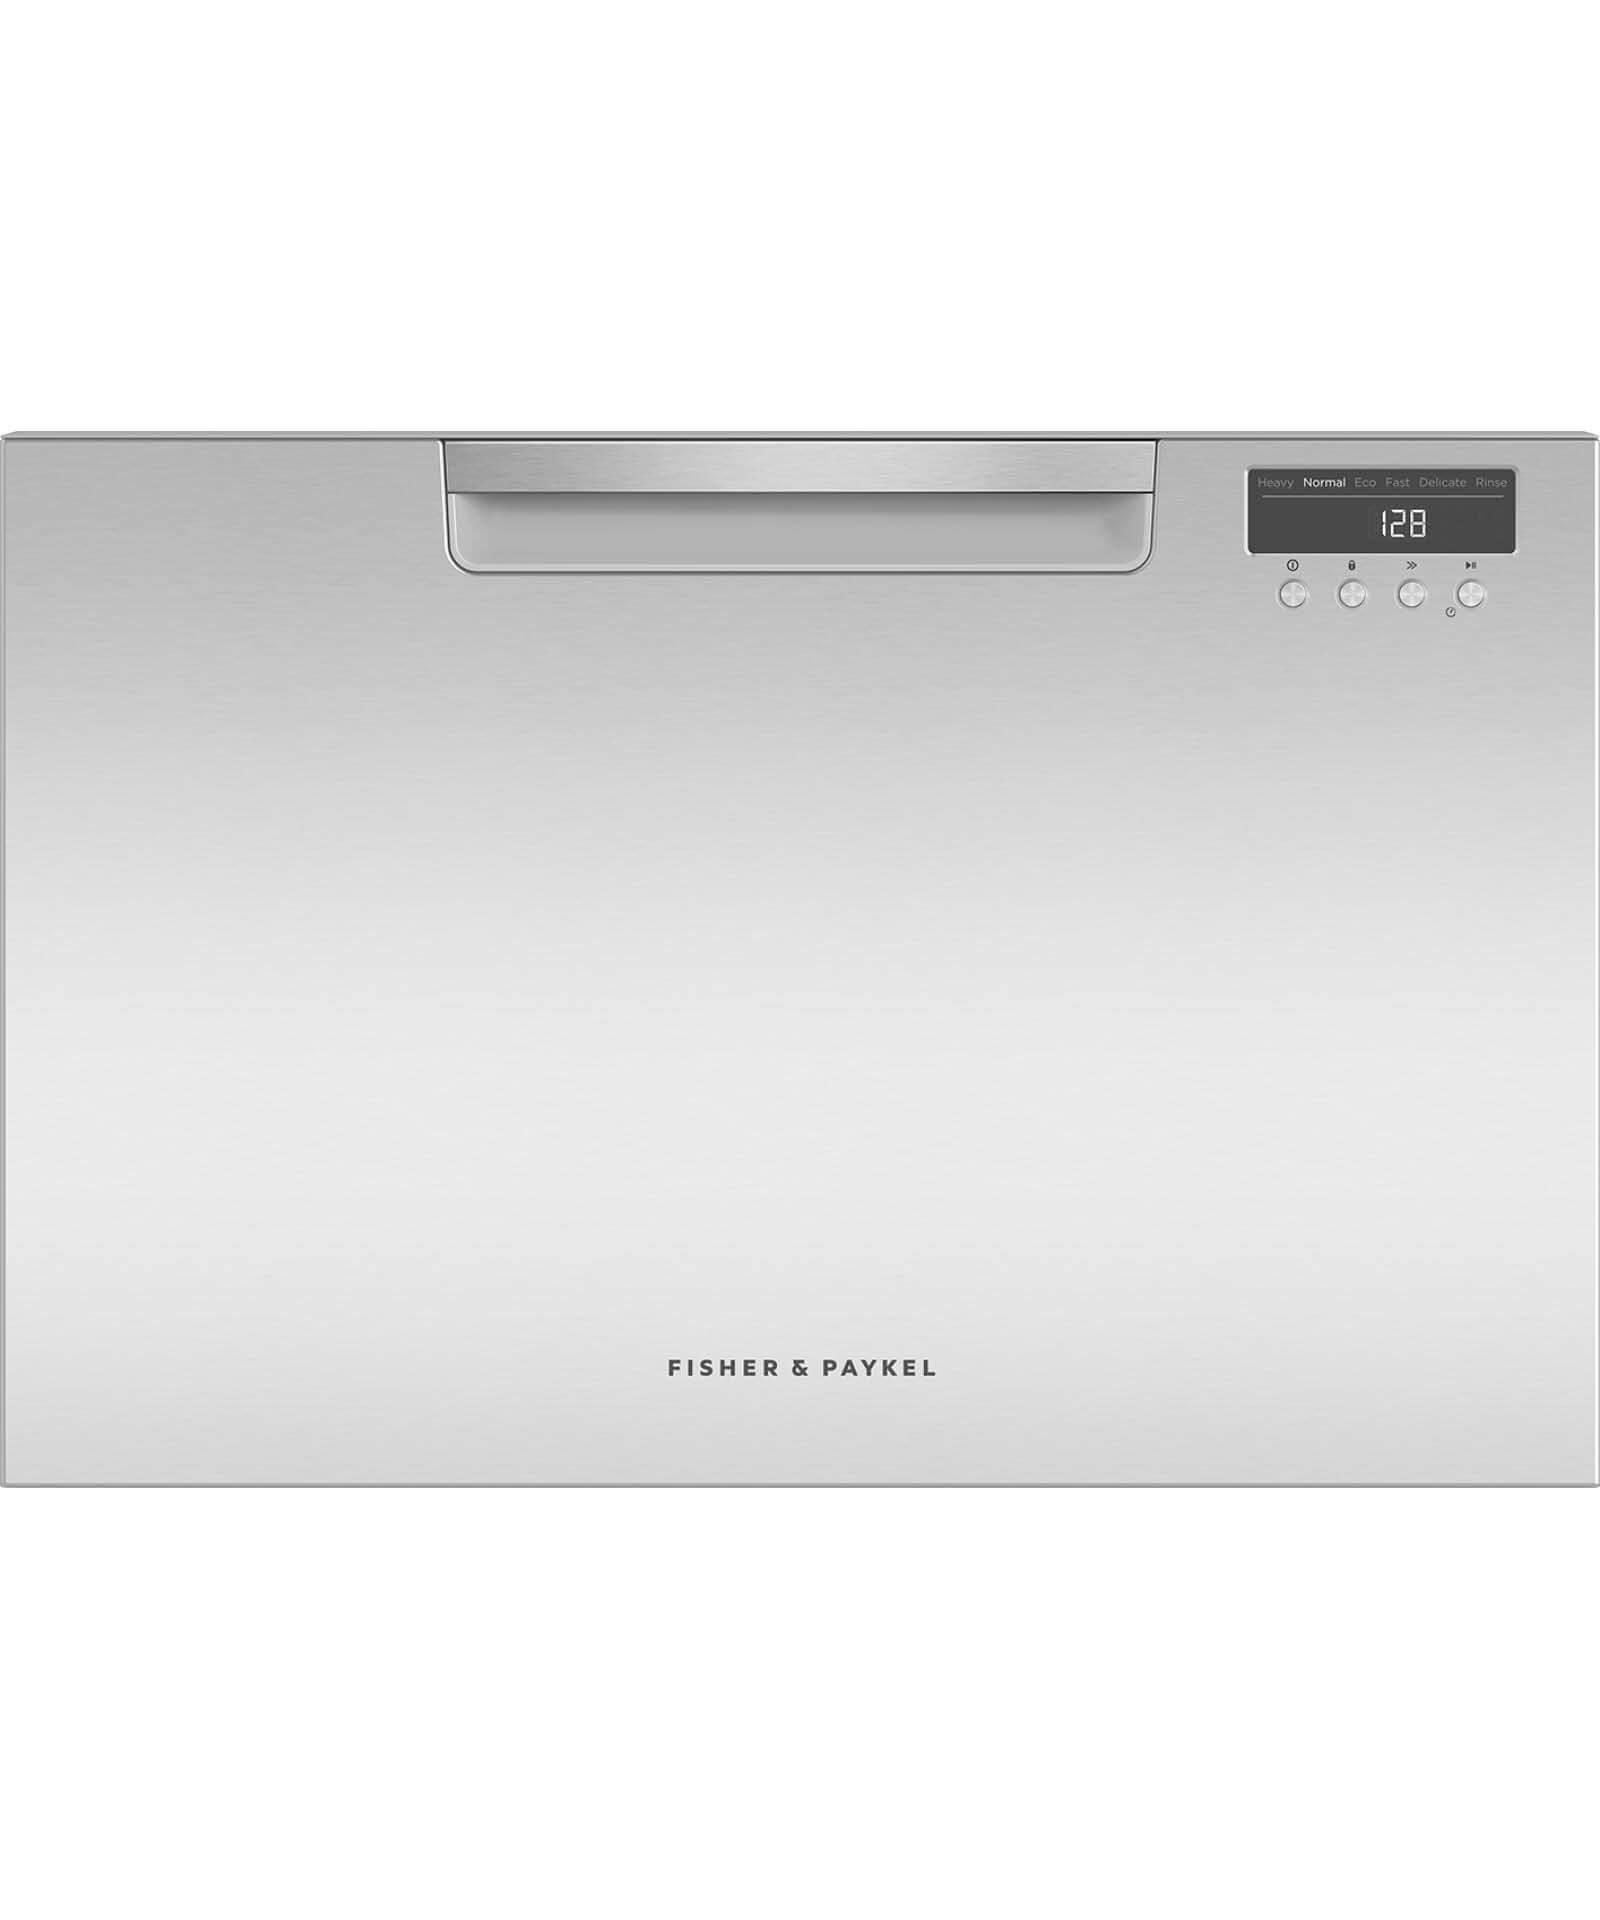 DISPLAY MODEL--Single DishDrawer Dishwasher, 7 Place Settings